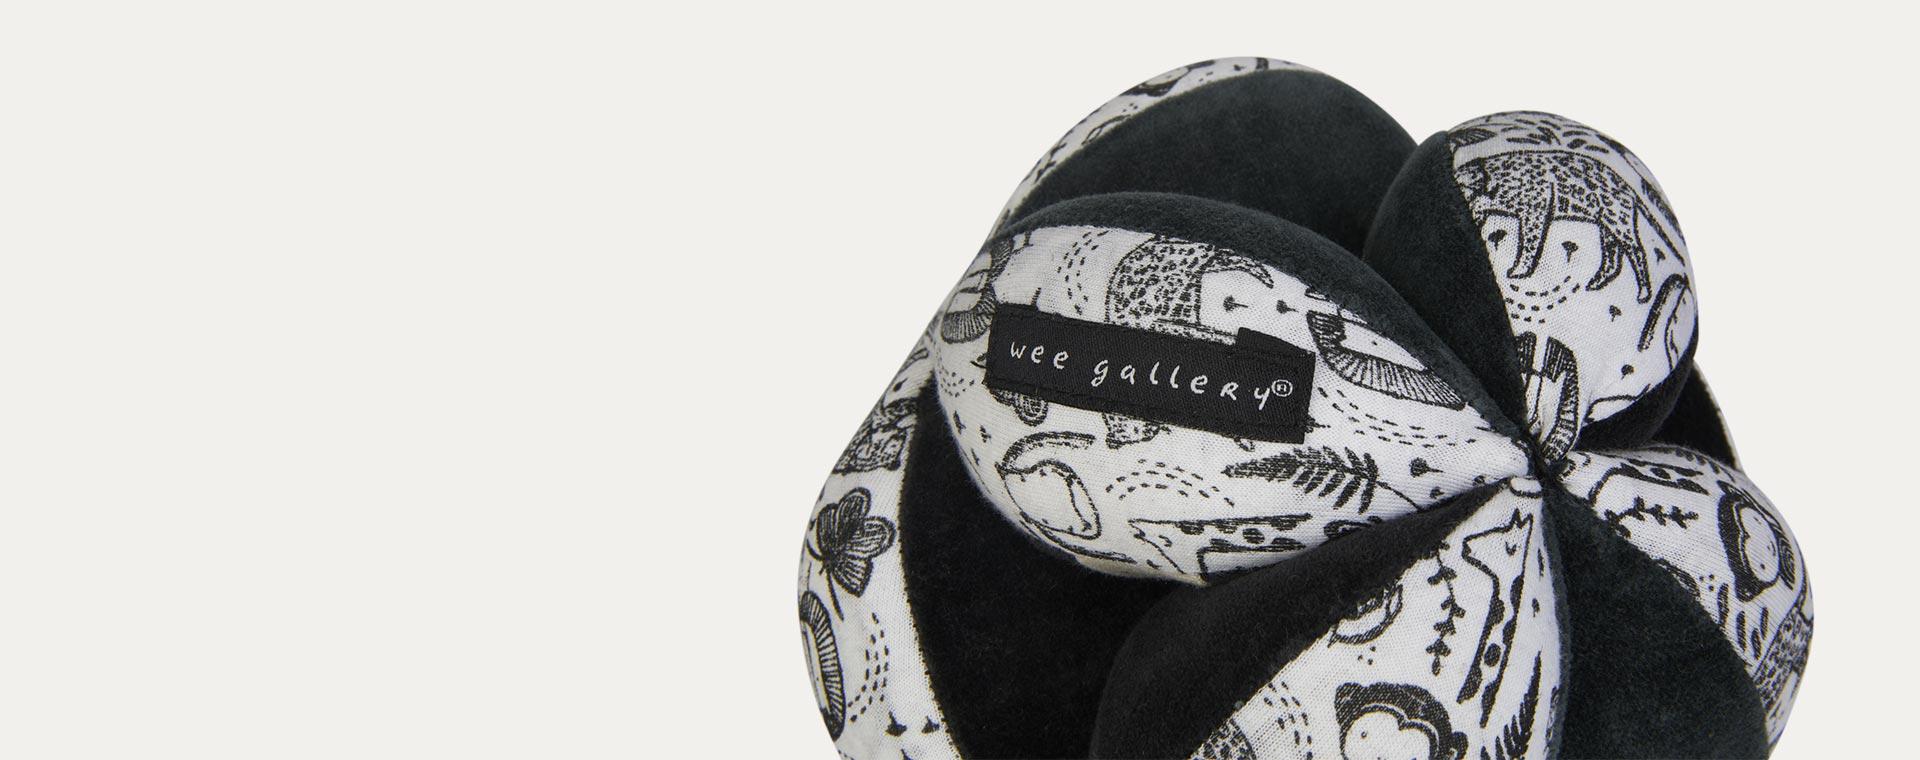 Wild Wee Gallery Sensory Clutch Ball